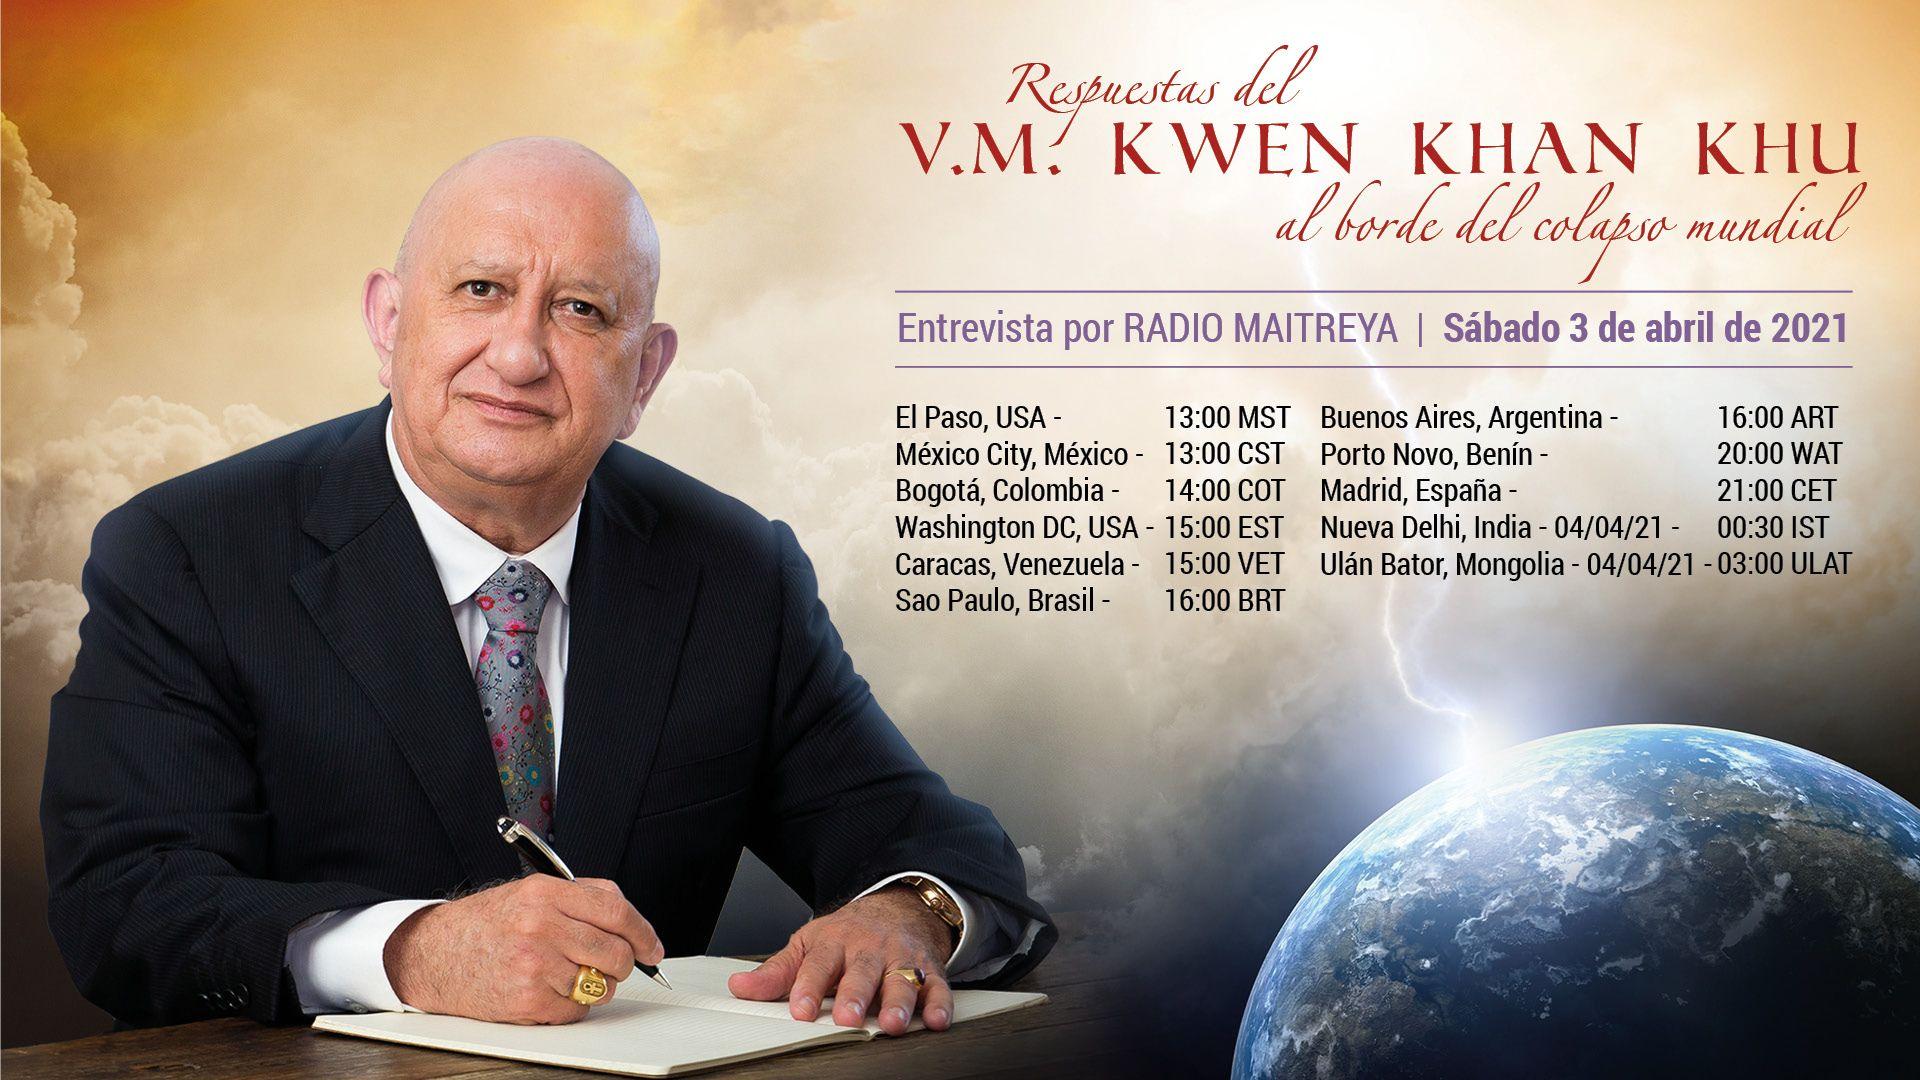 Interview with V.M. Kwen Khan Khu (03/04/2021)